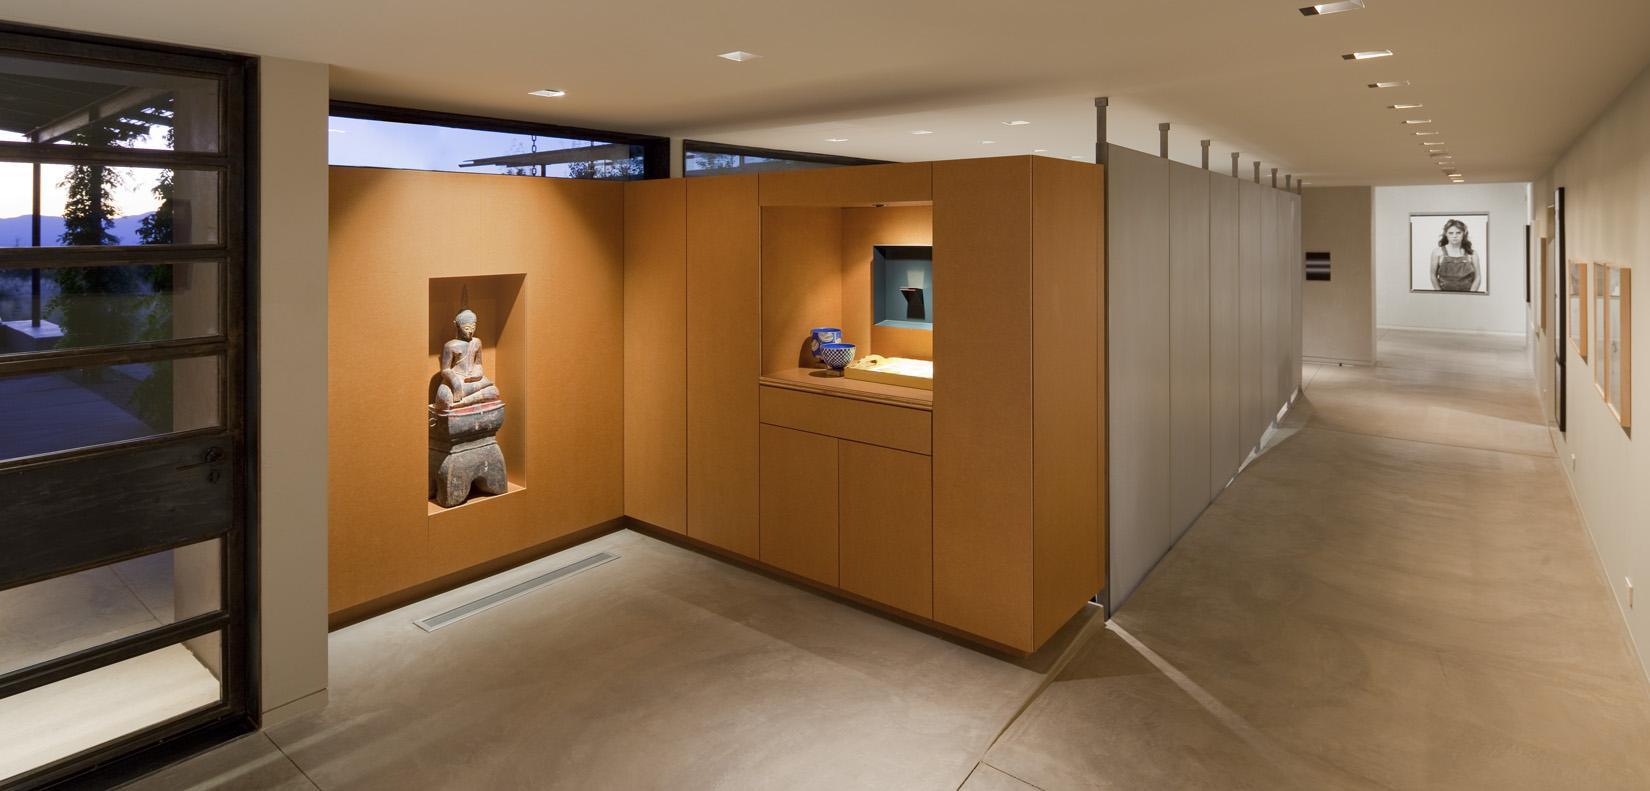 Hallway, Art, Desert House in Santa Fe, New Mexico